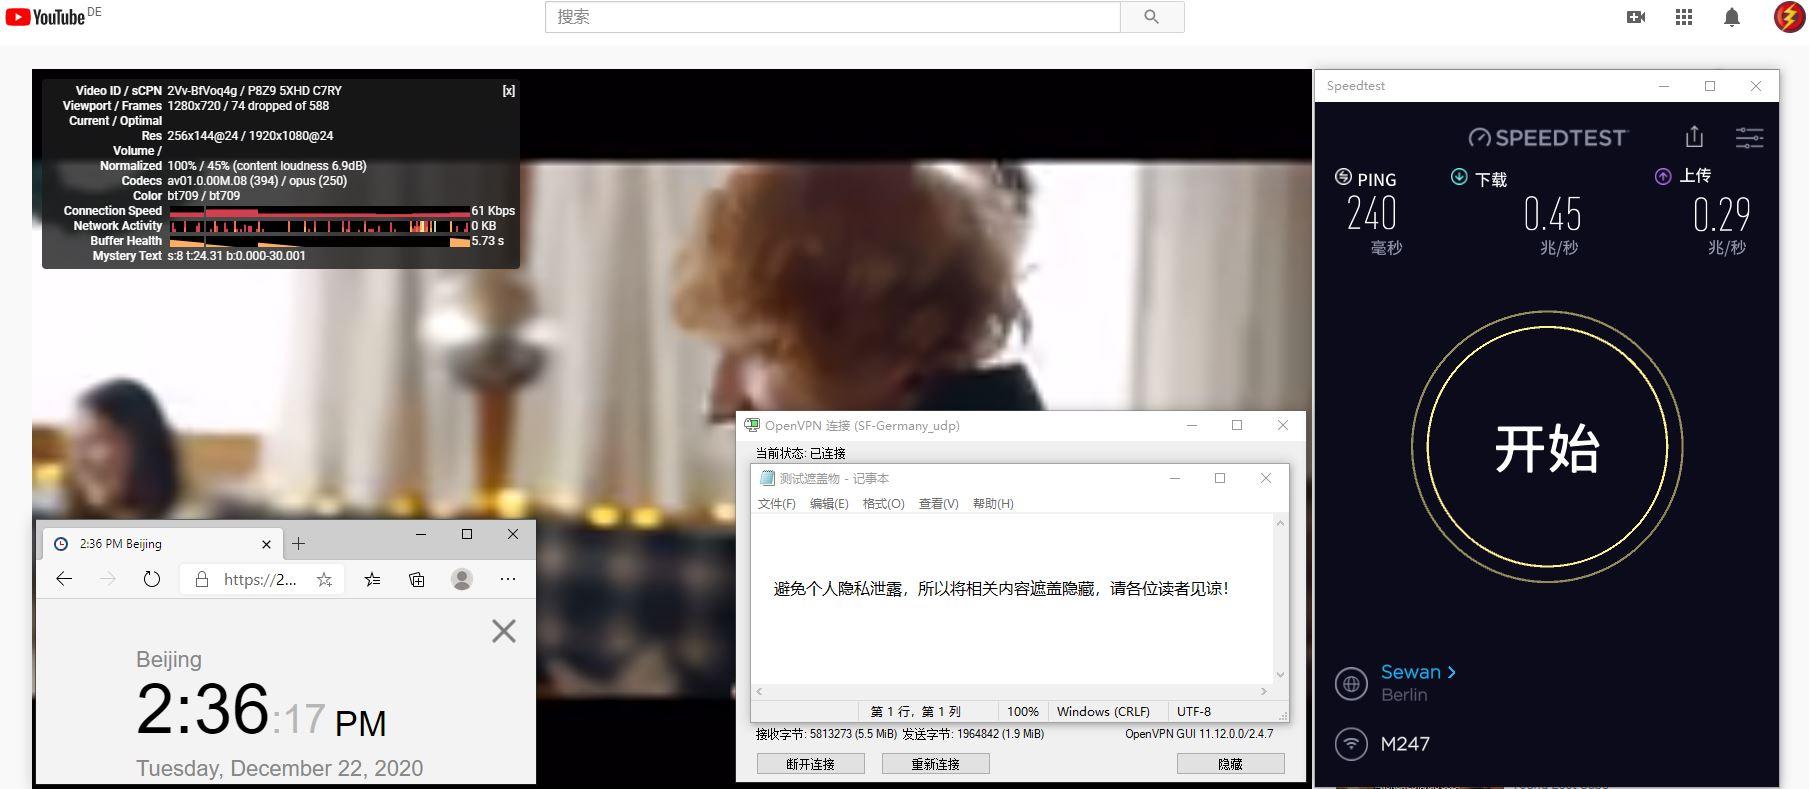 Windows10 SurfsharkVPN Germany 服务器 中国VPN 翻墙 科学上网 测试 - 20201222